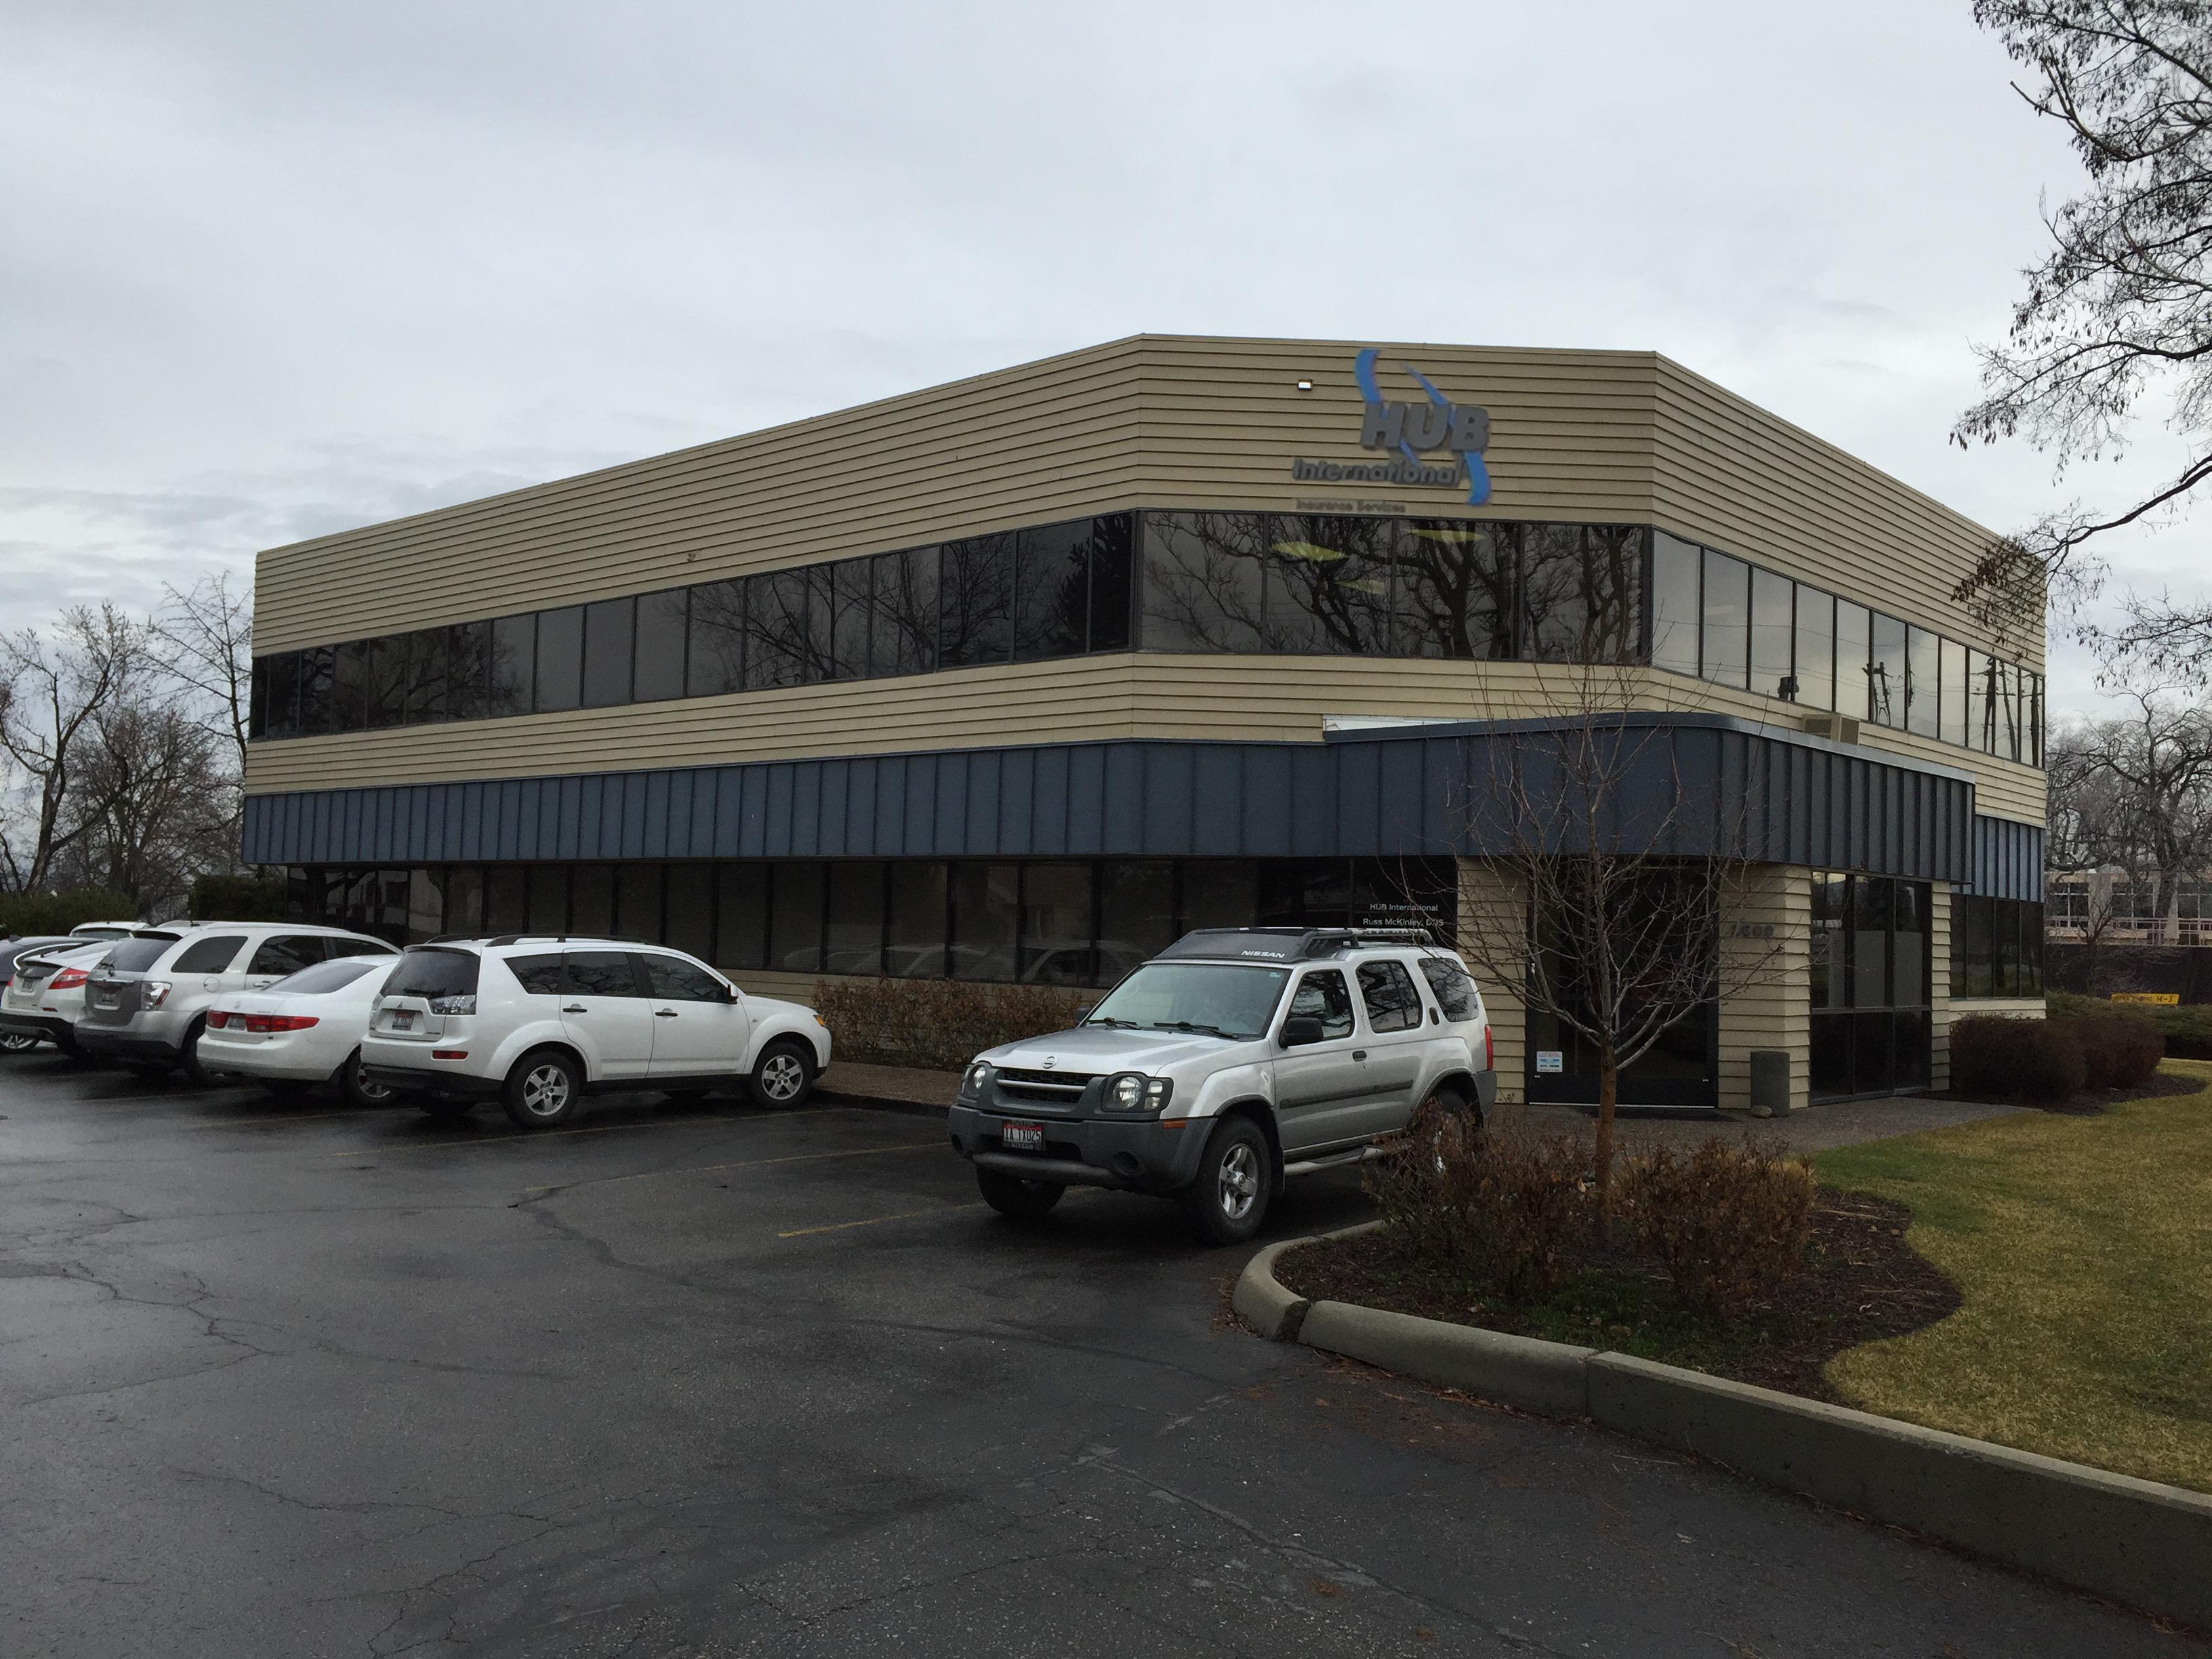 Insurance Boise Brokers Hub International